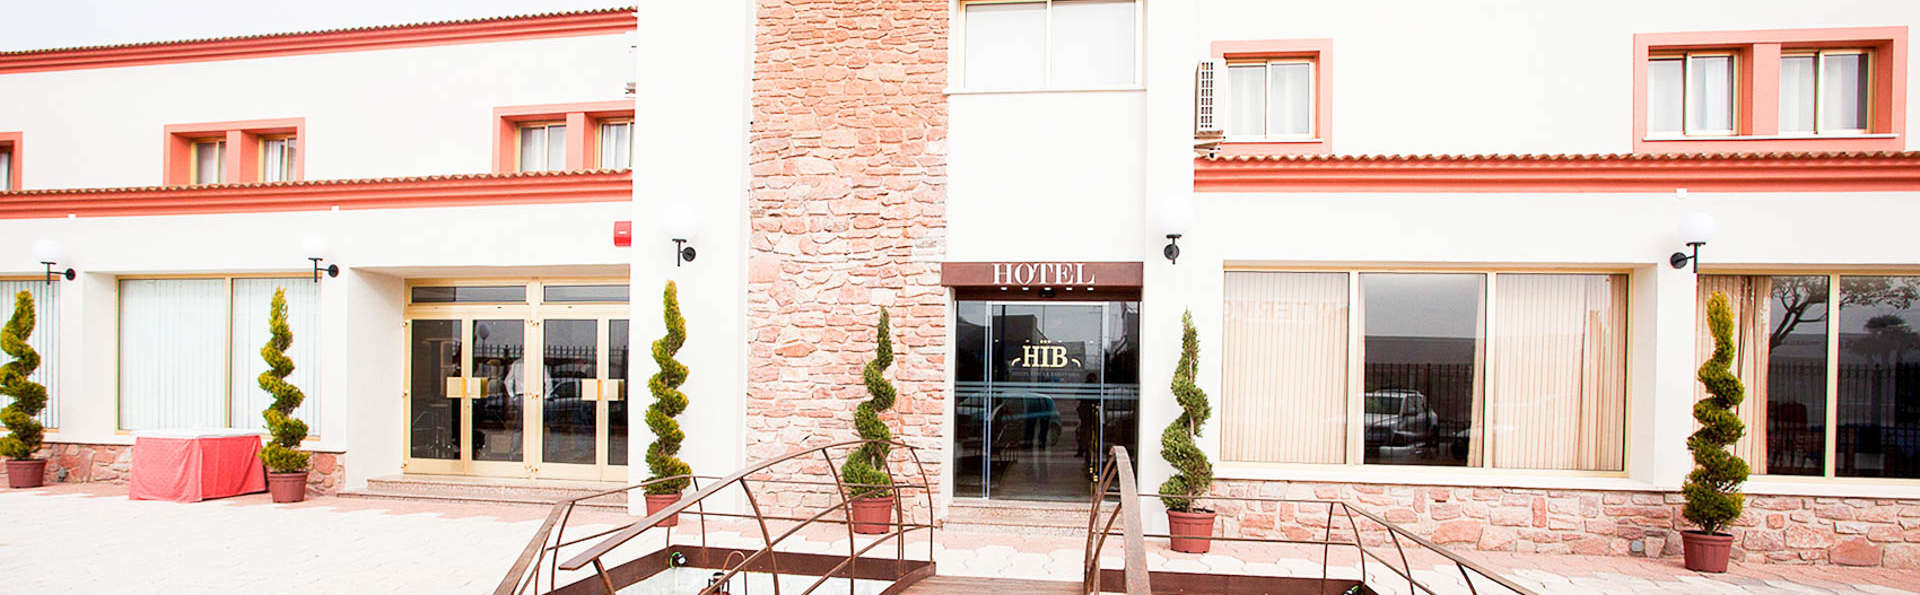 Hotel Insula Barataria - EDIT_NEW_FRONT.jpg